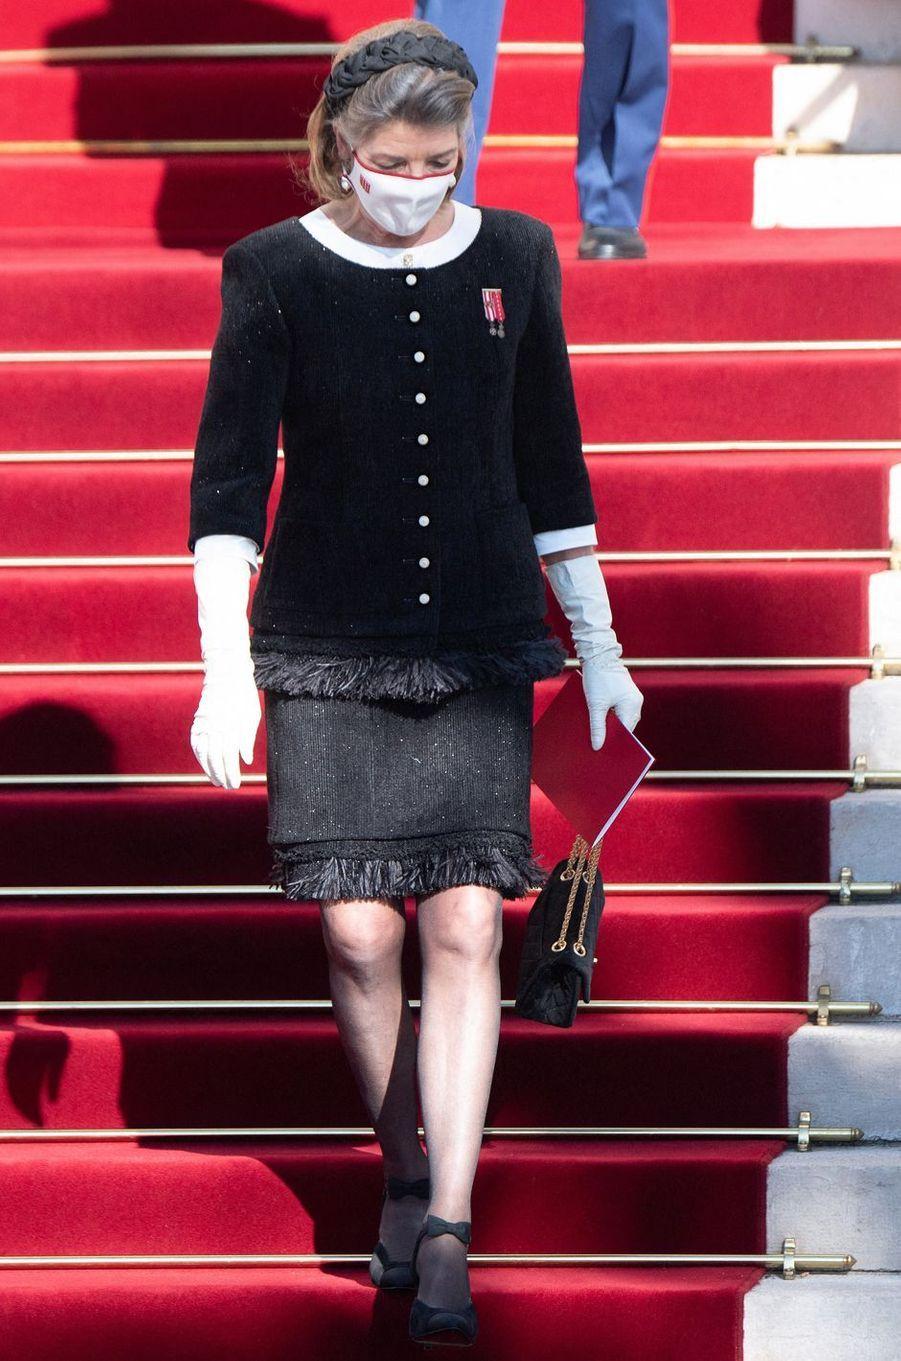 La princesse Caroline de Hanovre à Monaco, le 19 novembre 2020